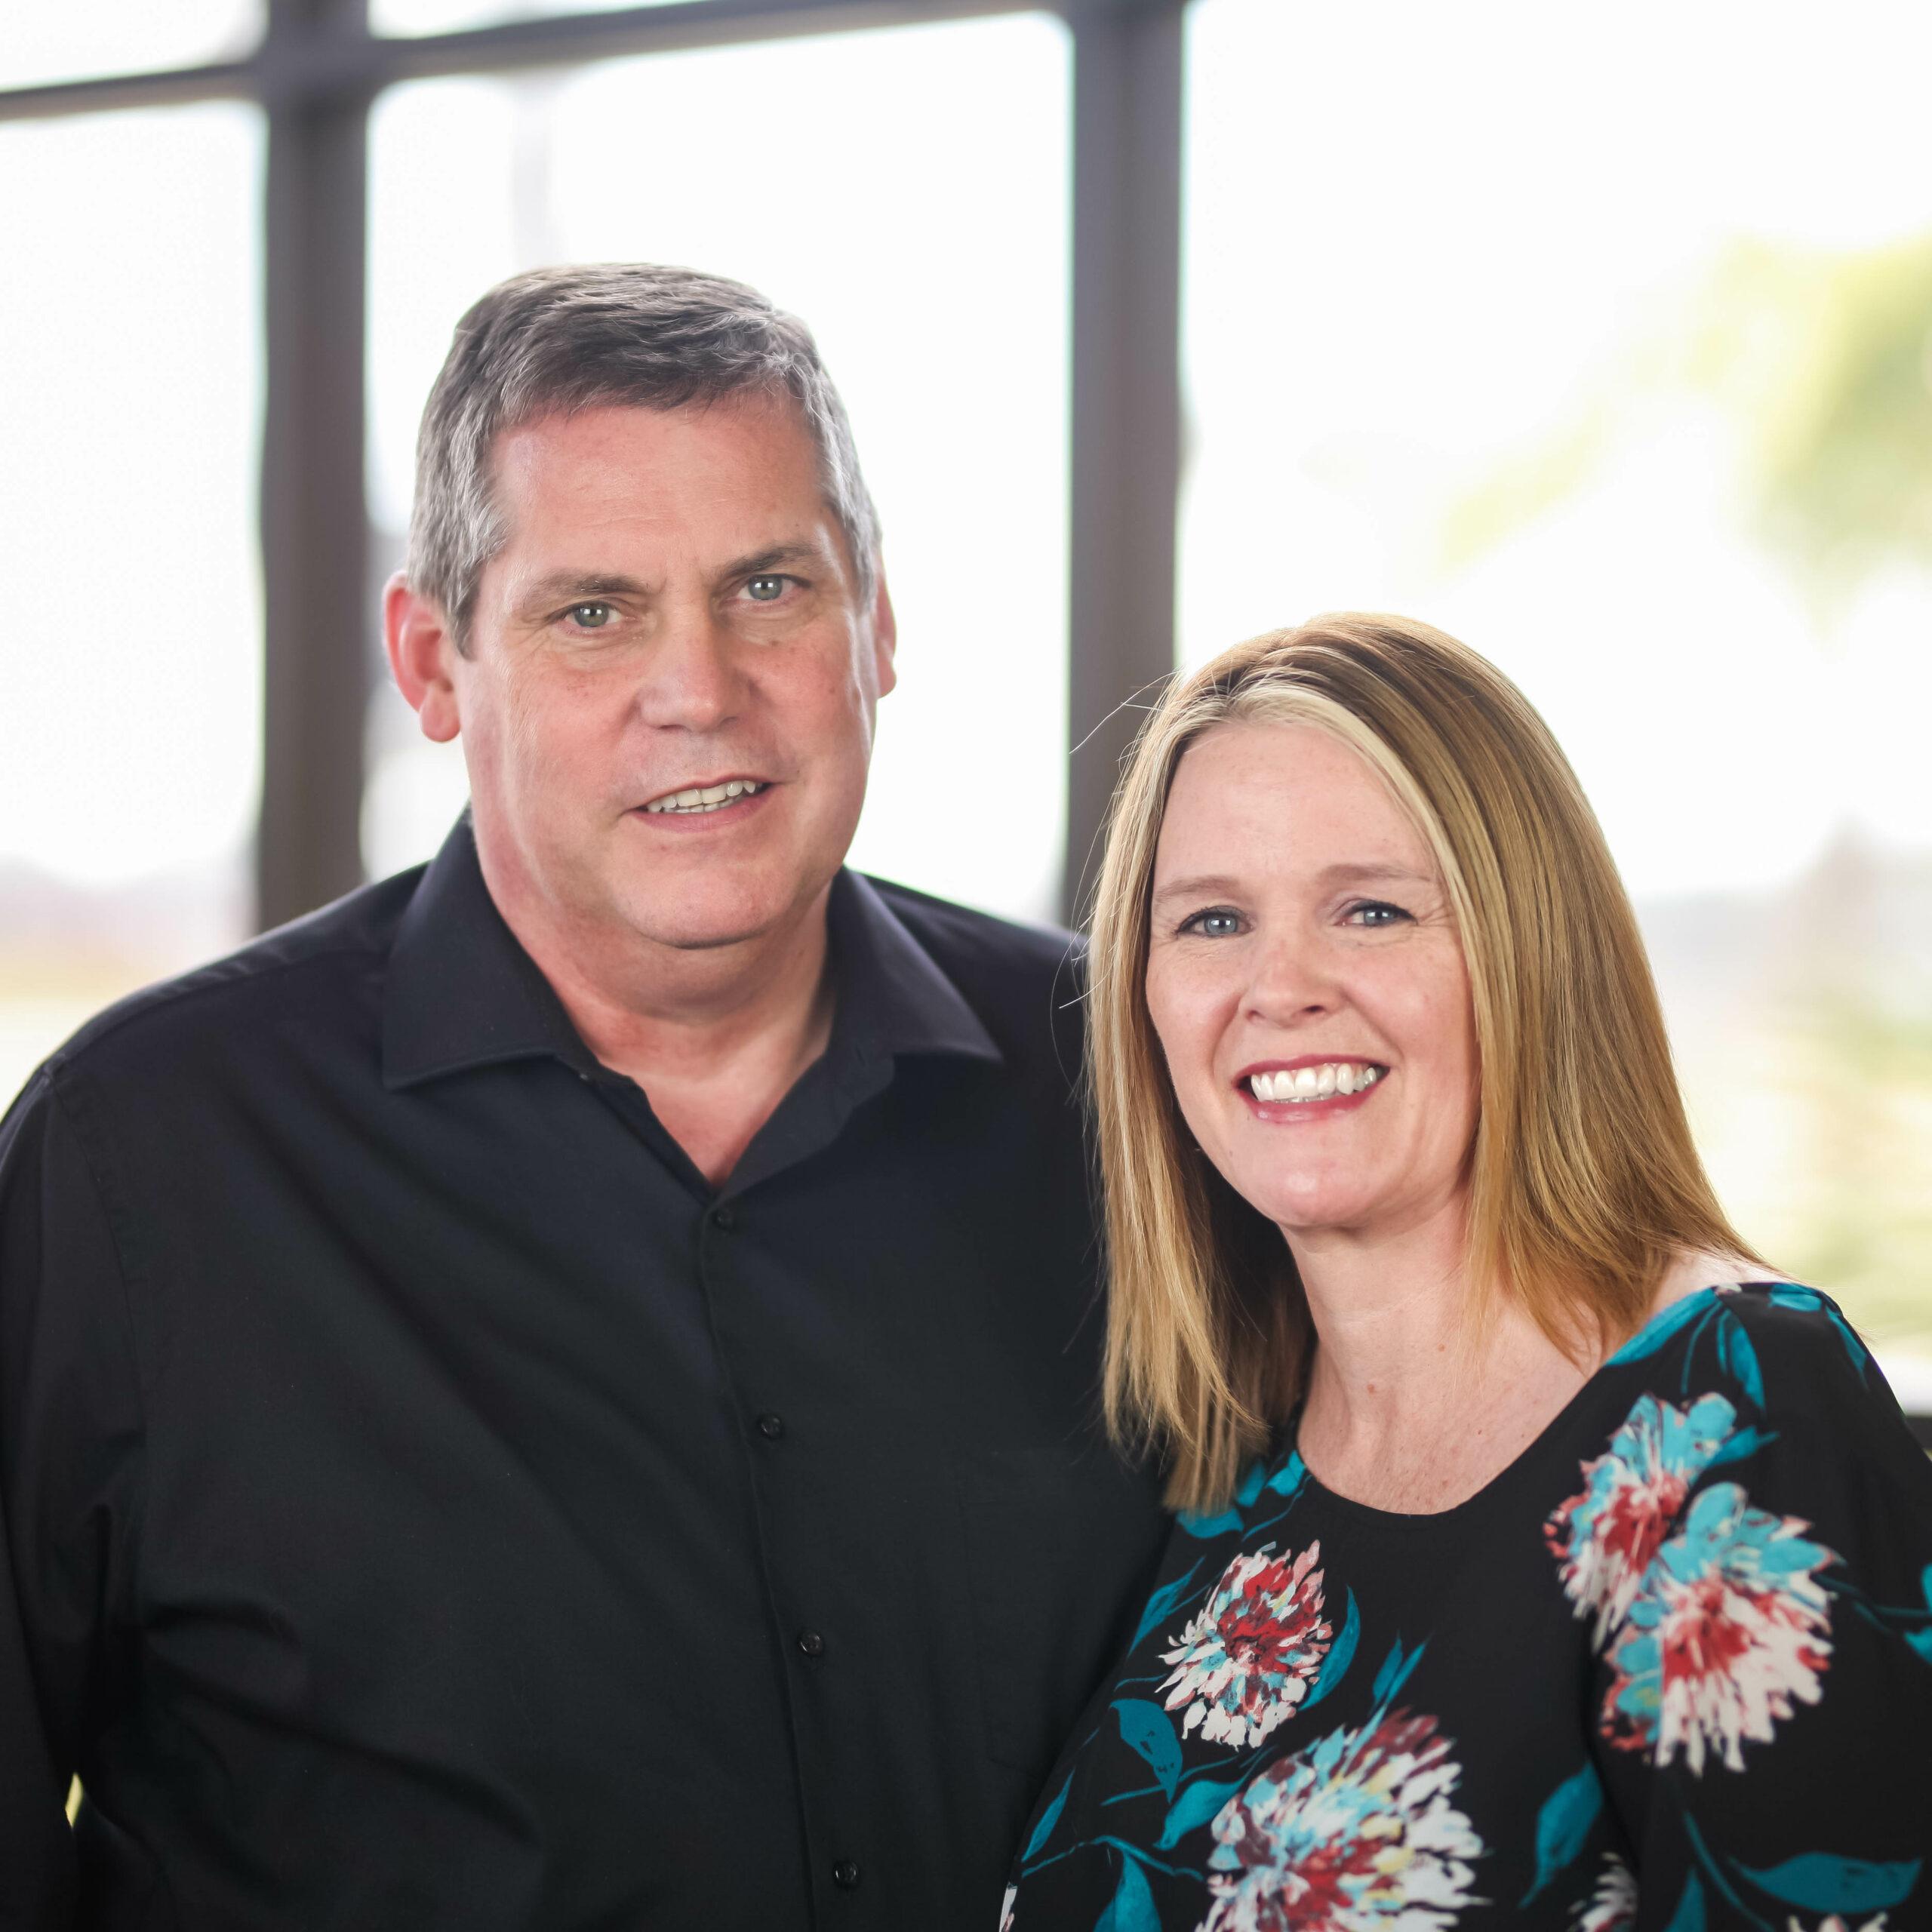 Kevin and Melanie Hayes